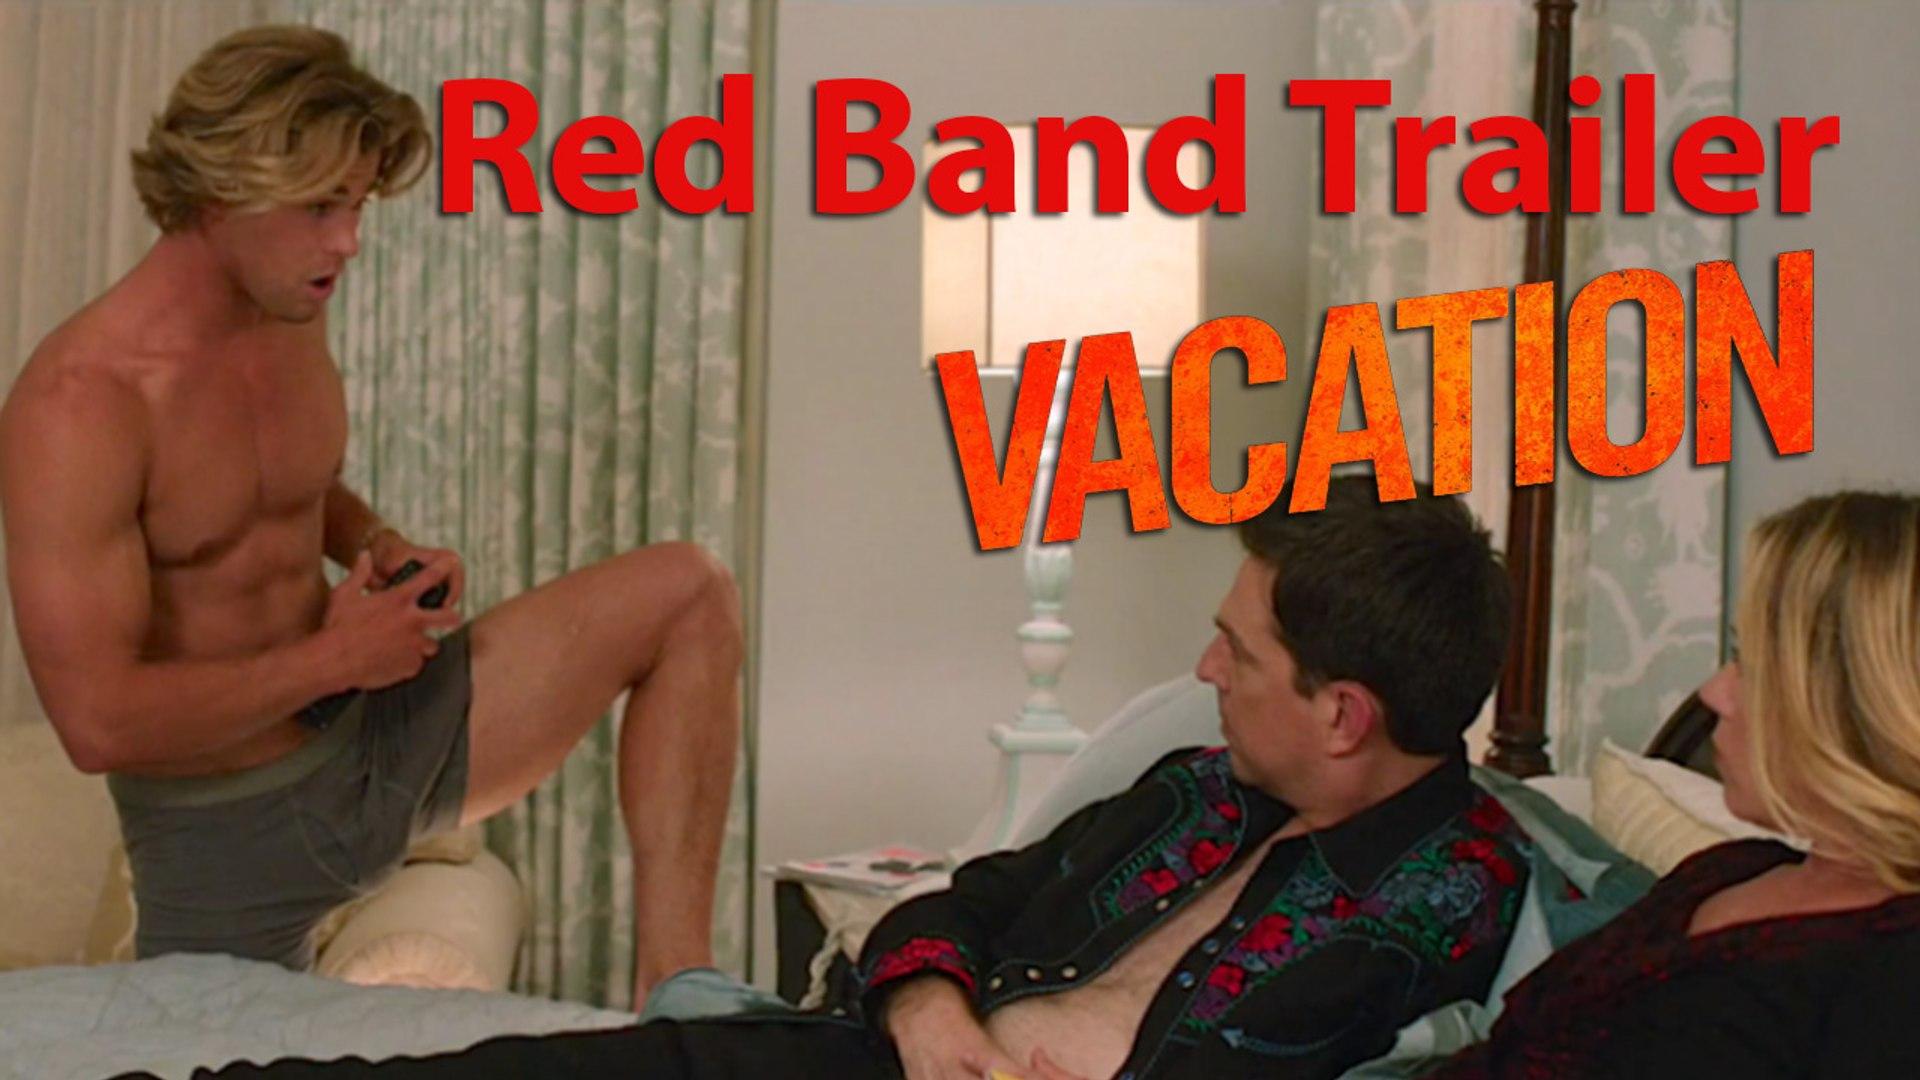 Vacation - Red Band Trailer #1 [Full HD] (Ed Helms, Christina Applegate, Chris Hemsworth)